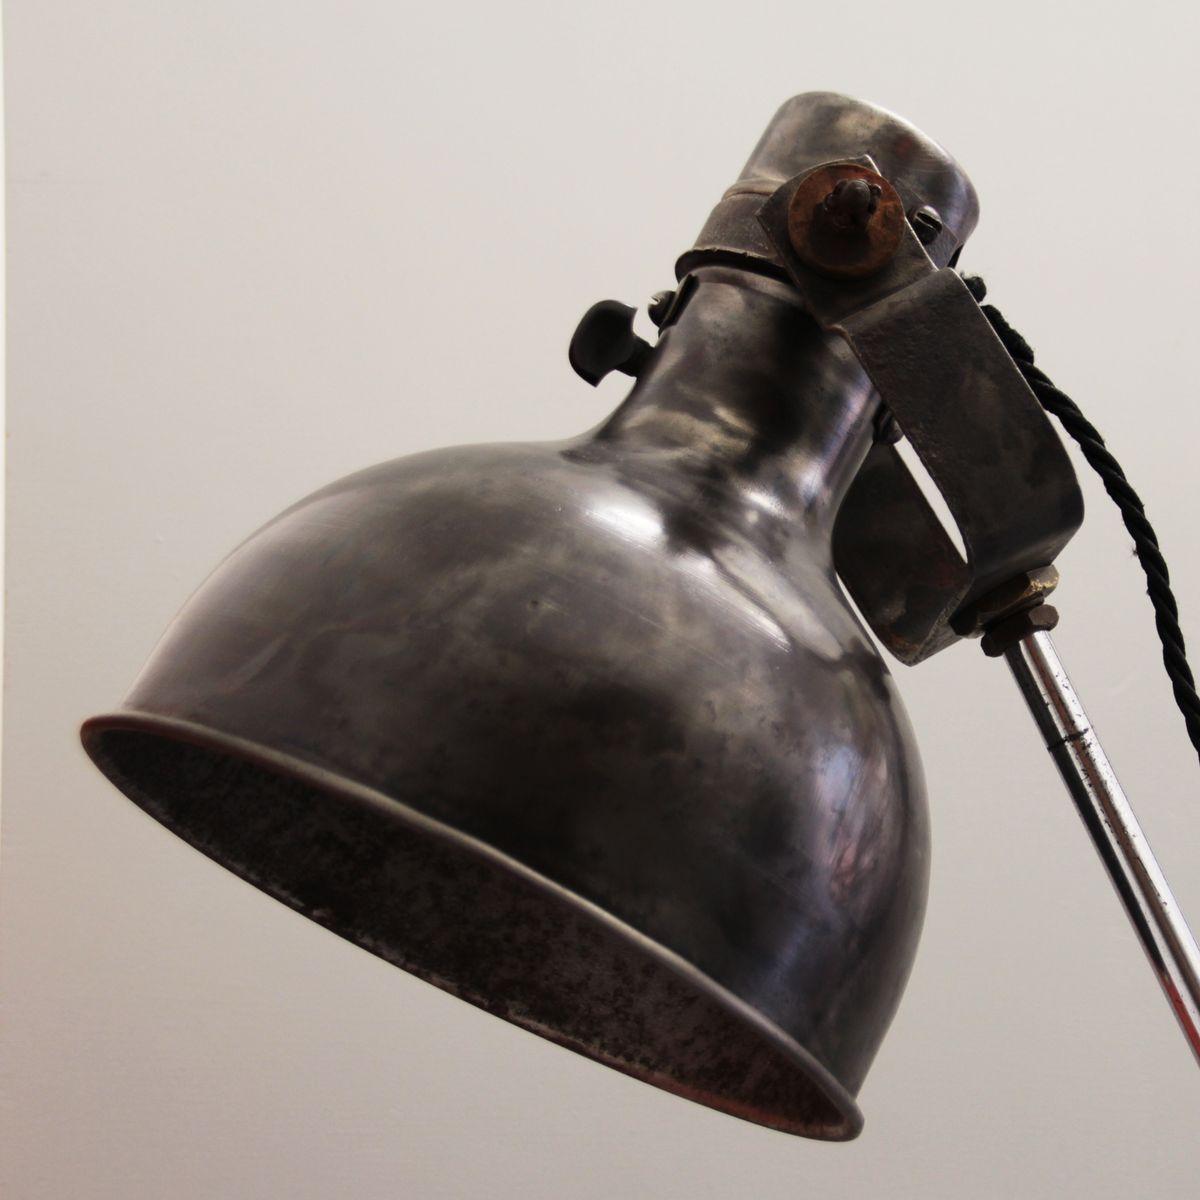 french industrial floor lamp 1920s